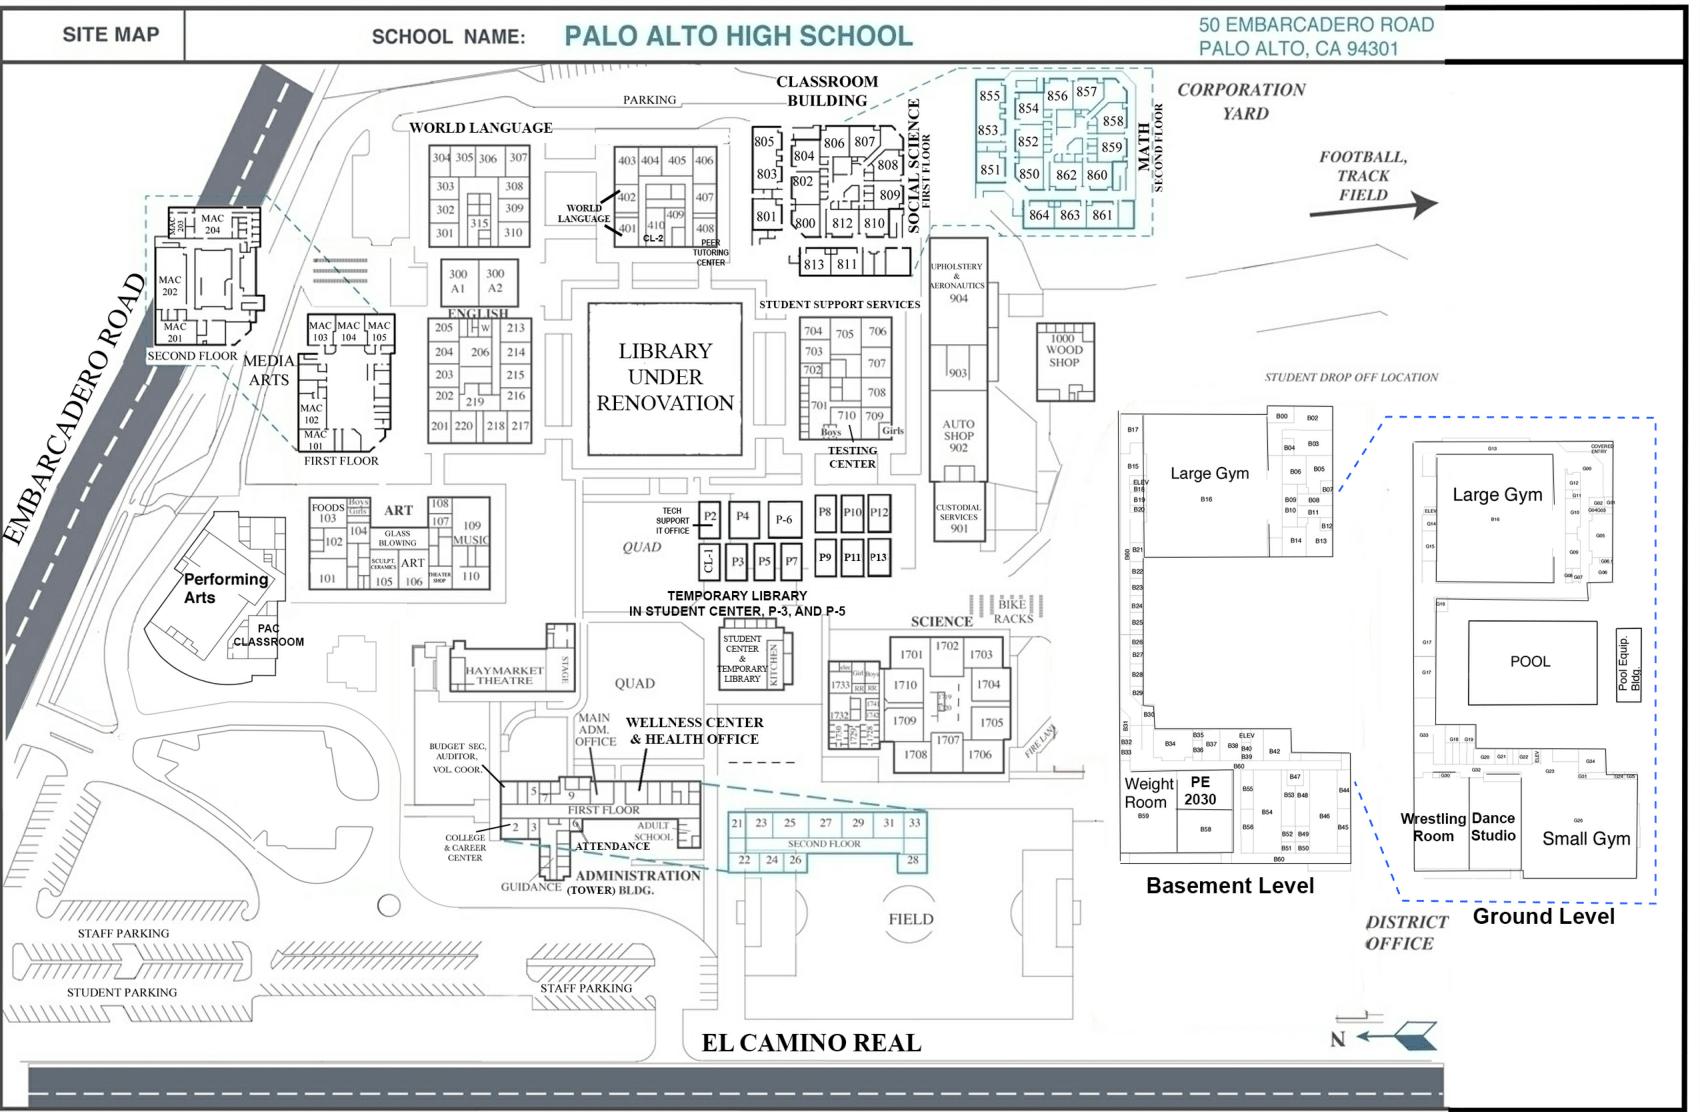 Palo Alto High School Map The Manhattan Prep GMAT Advantage | Comprehensive GMAT Prep Books